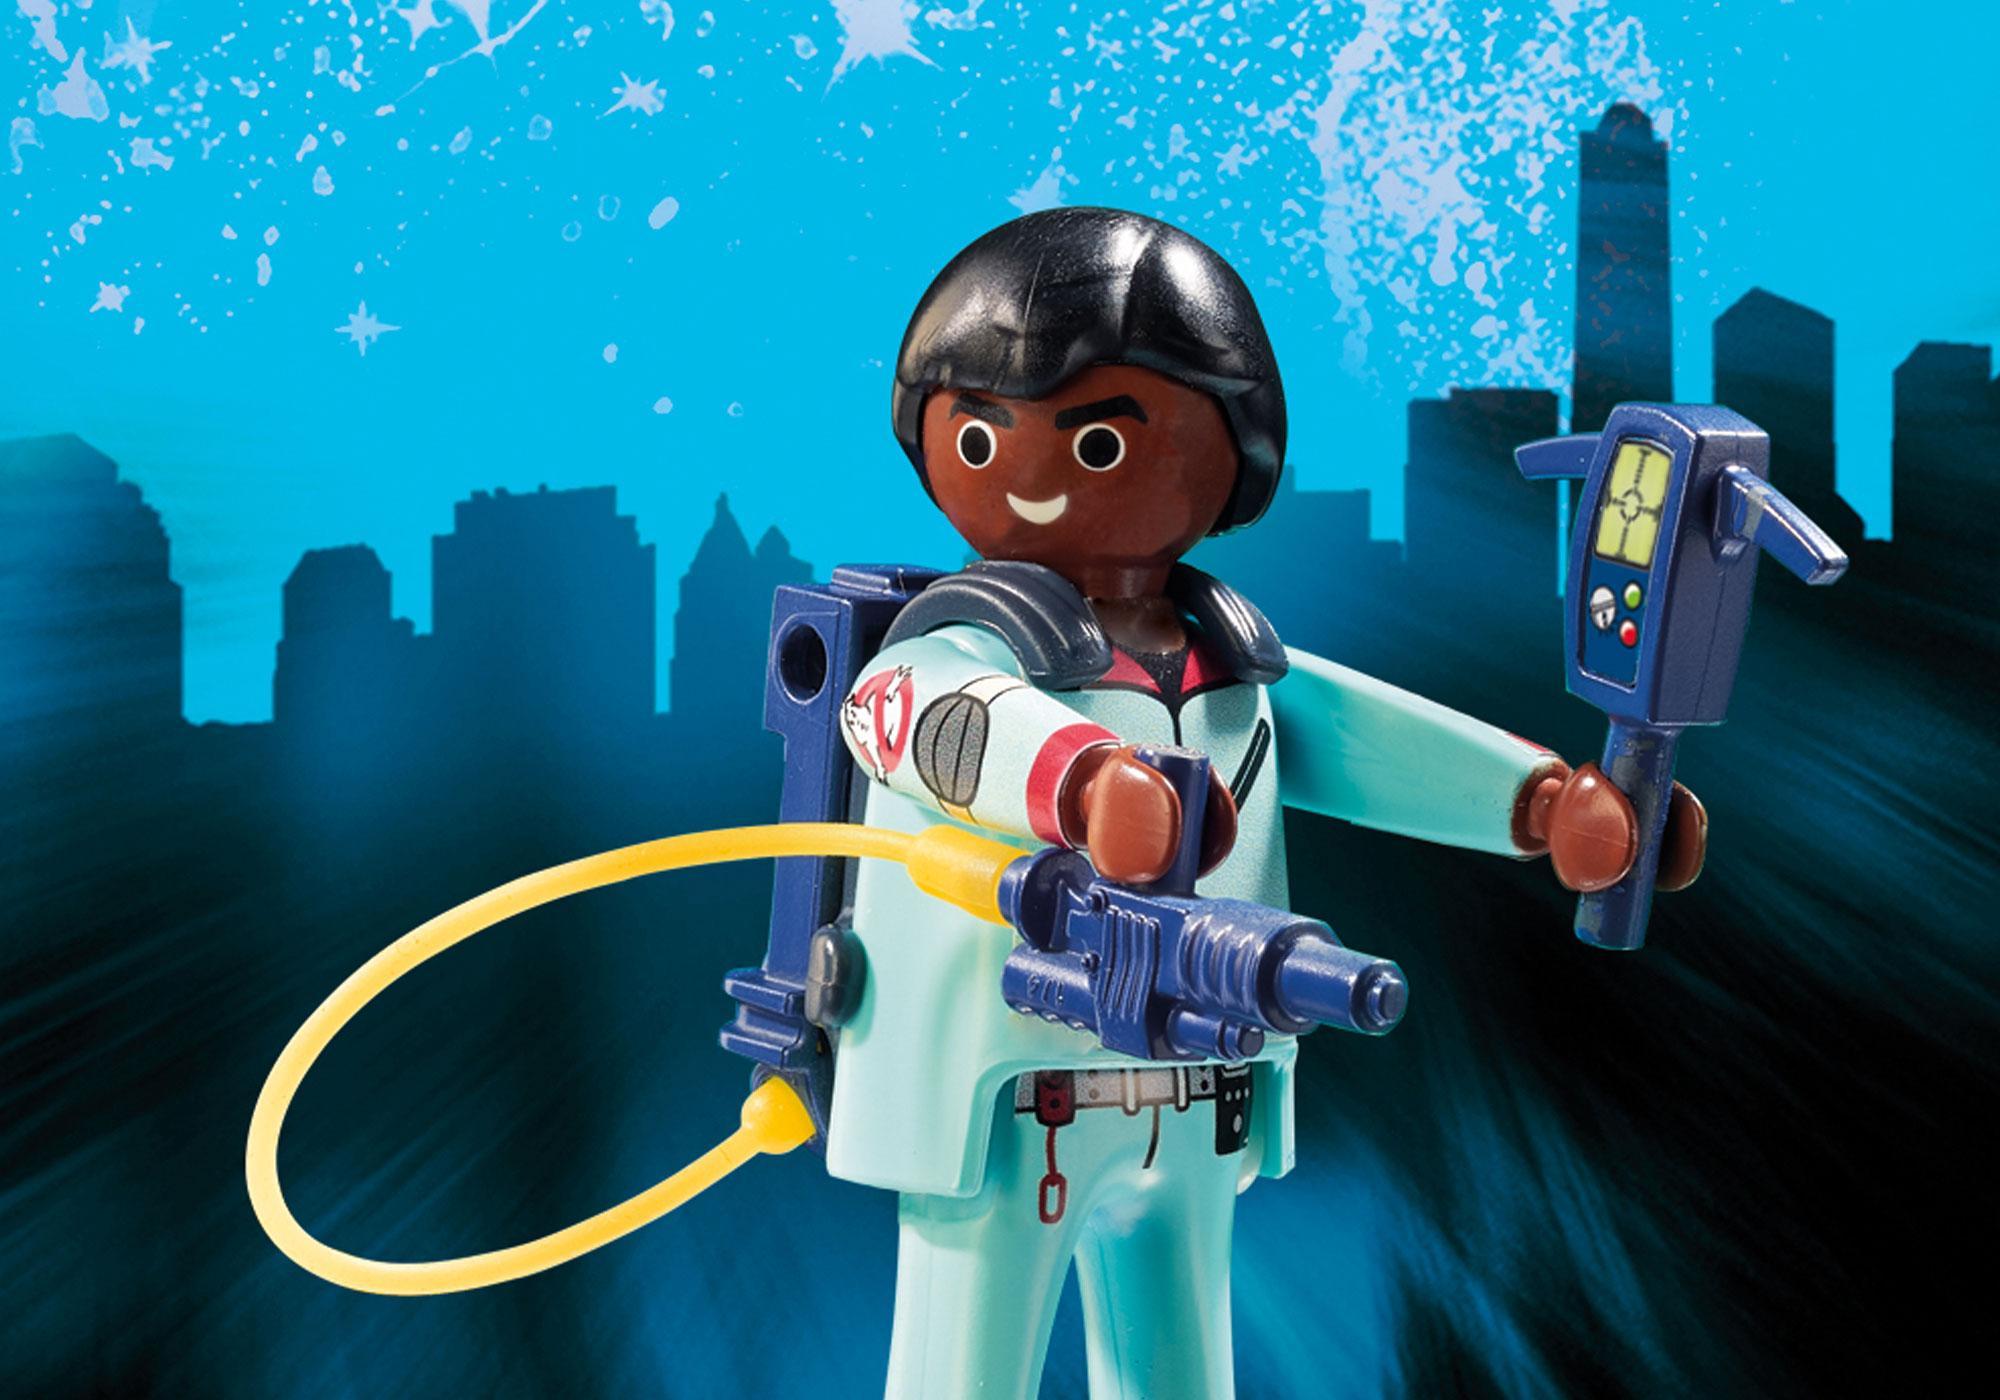 http://media.playmobil.com/i/playmobil/9387_product_extra2/Zeddemore med vandscooter